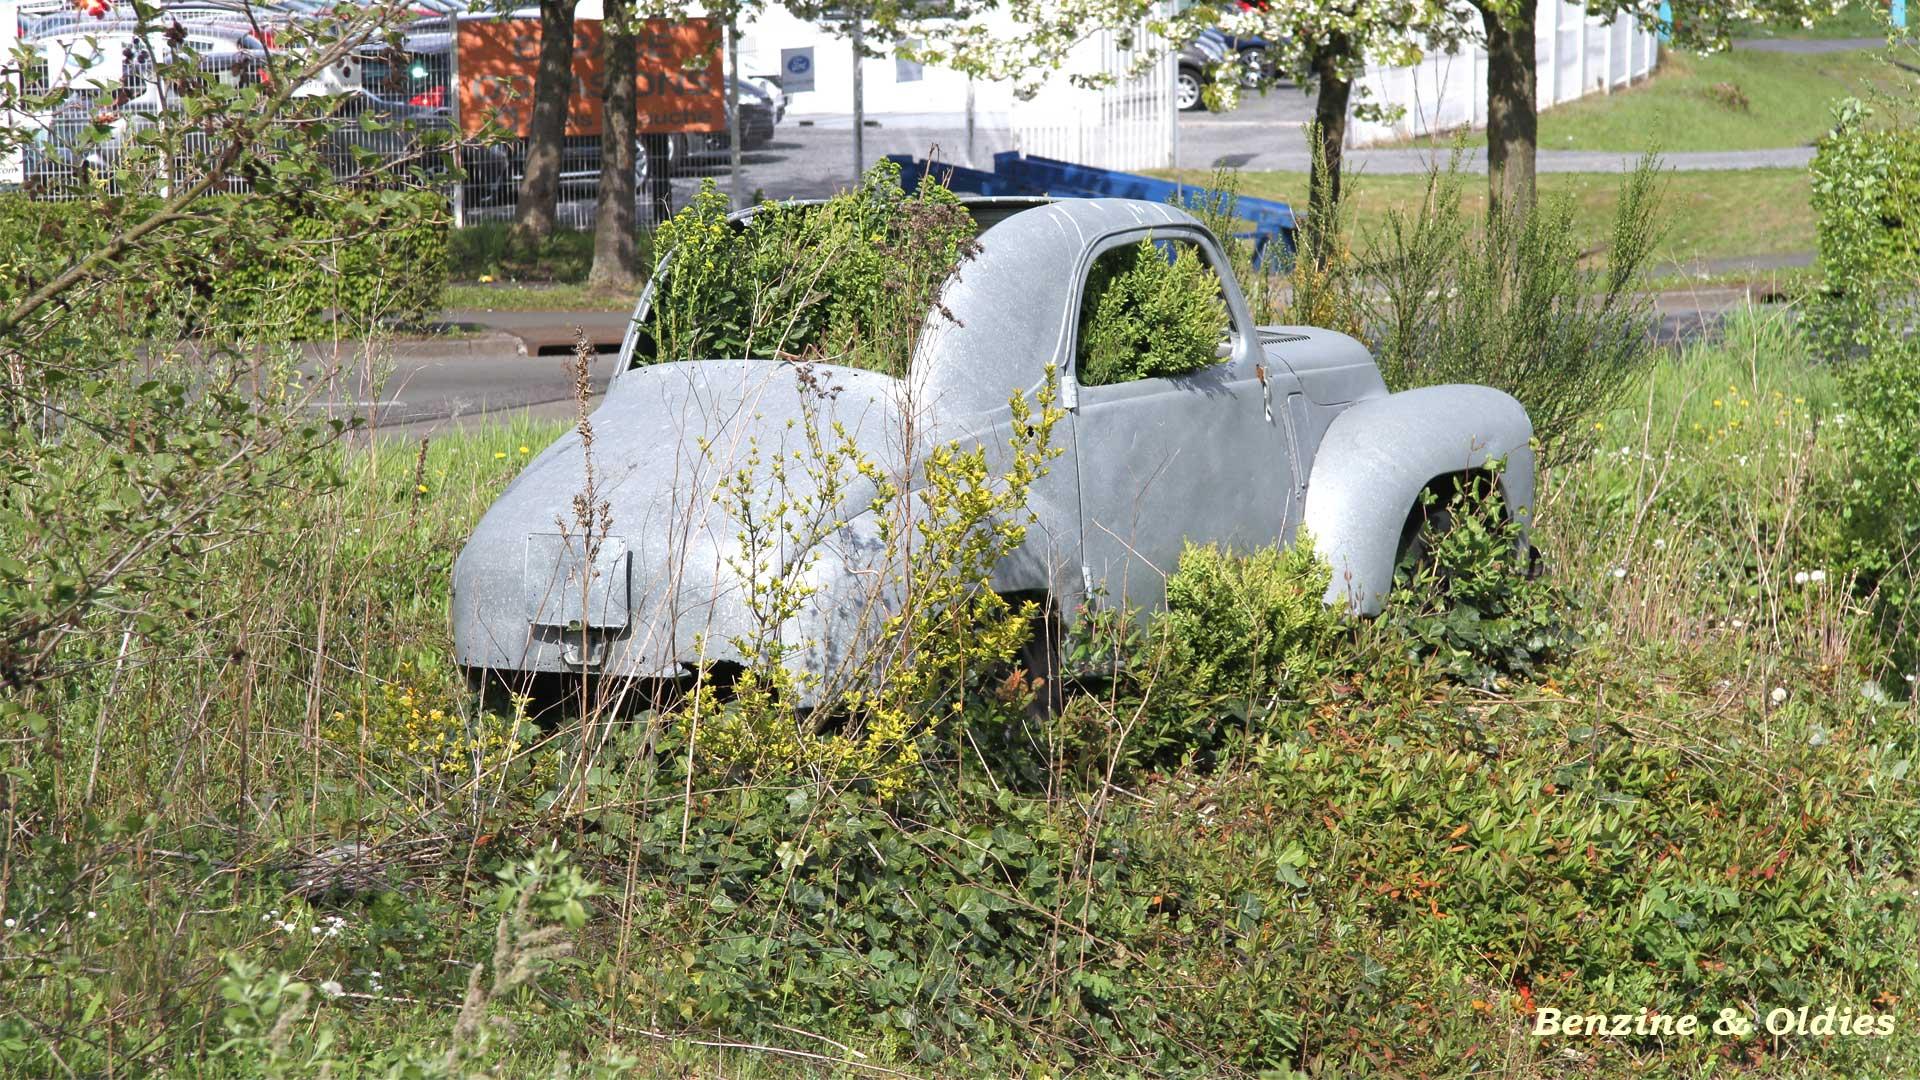 une Simca 6 carrosserie aluminium oubliée dans la nature - Simca6 424900simca6street23w19201080